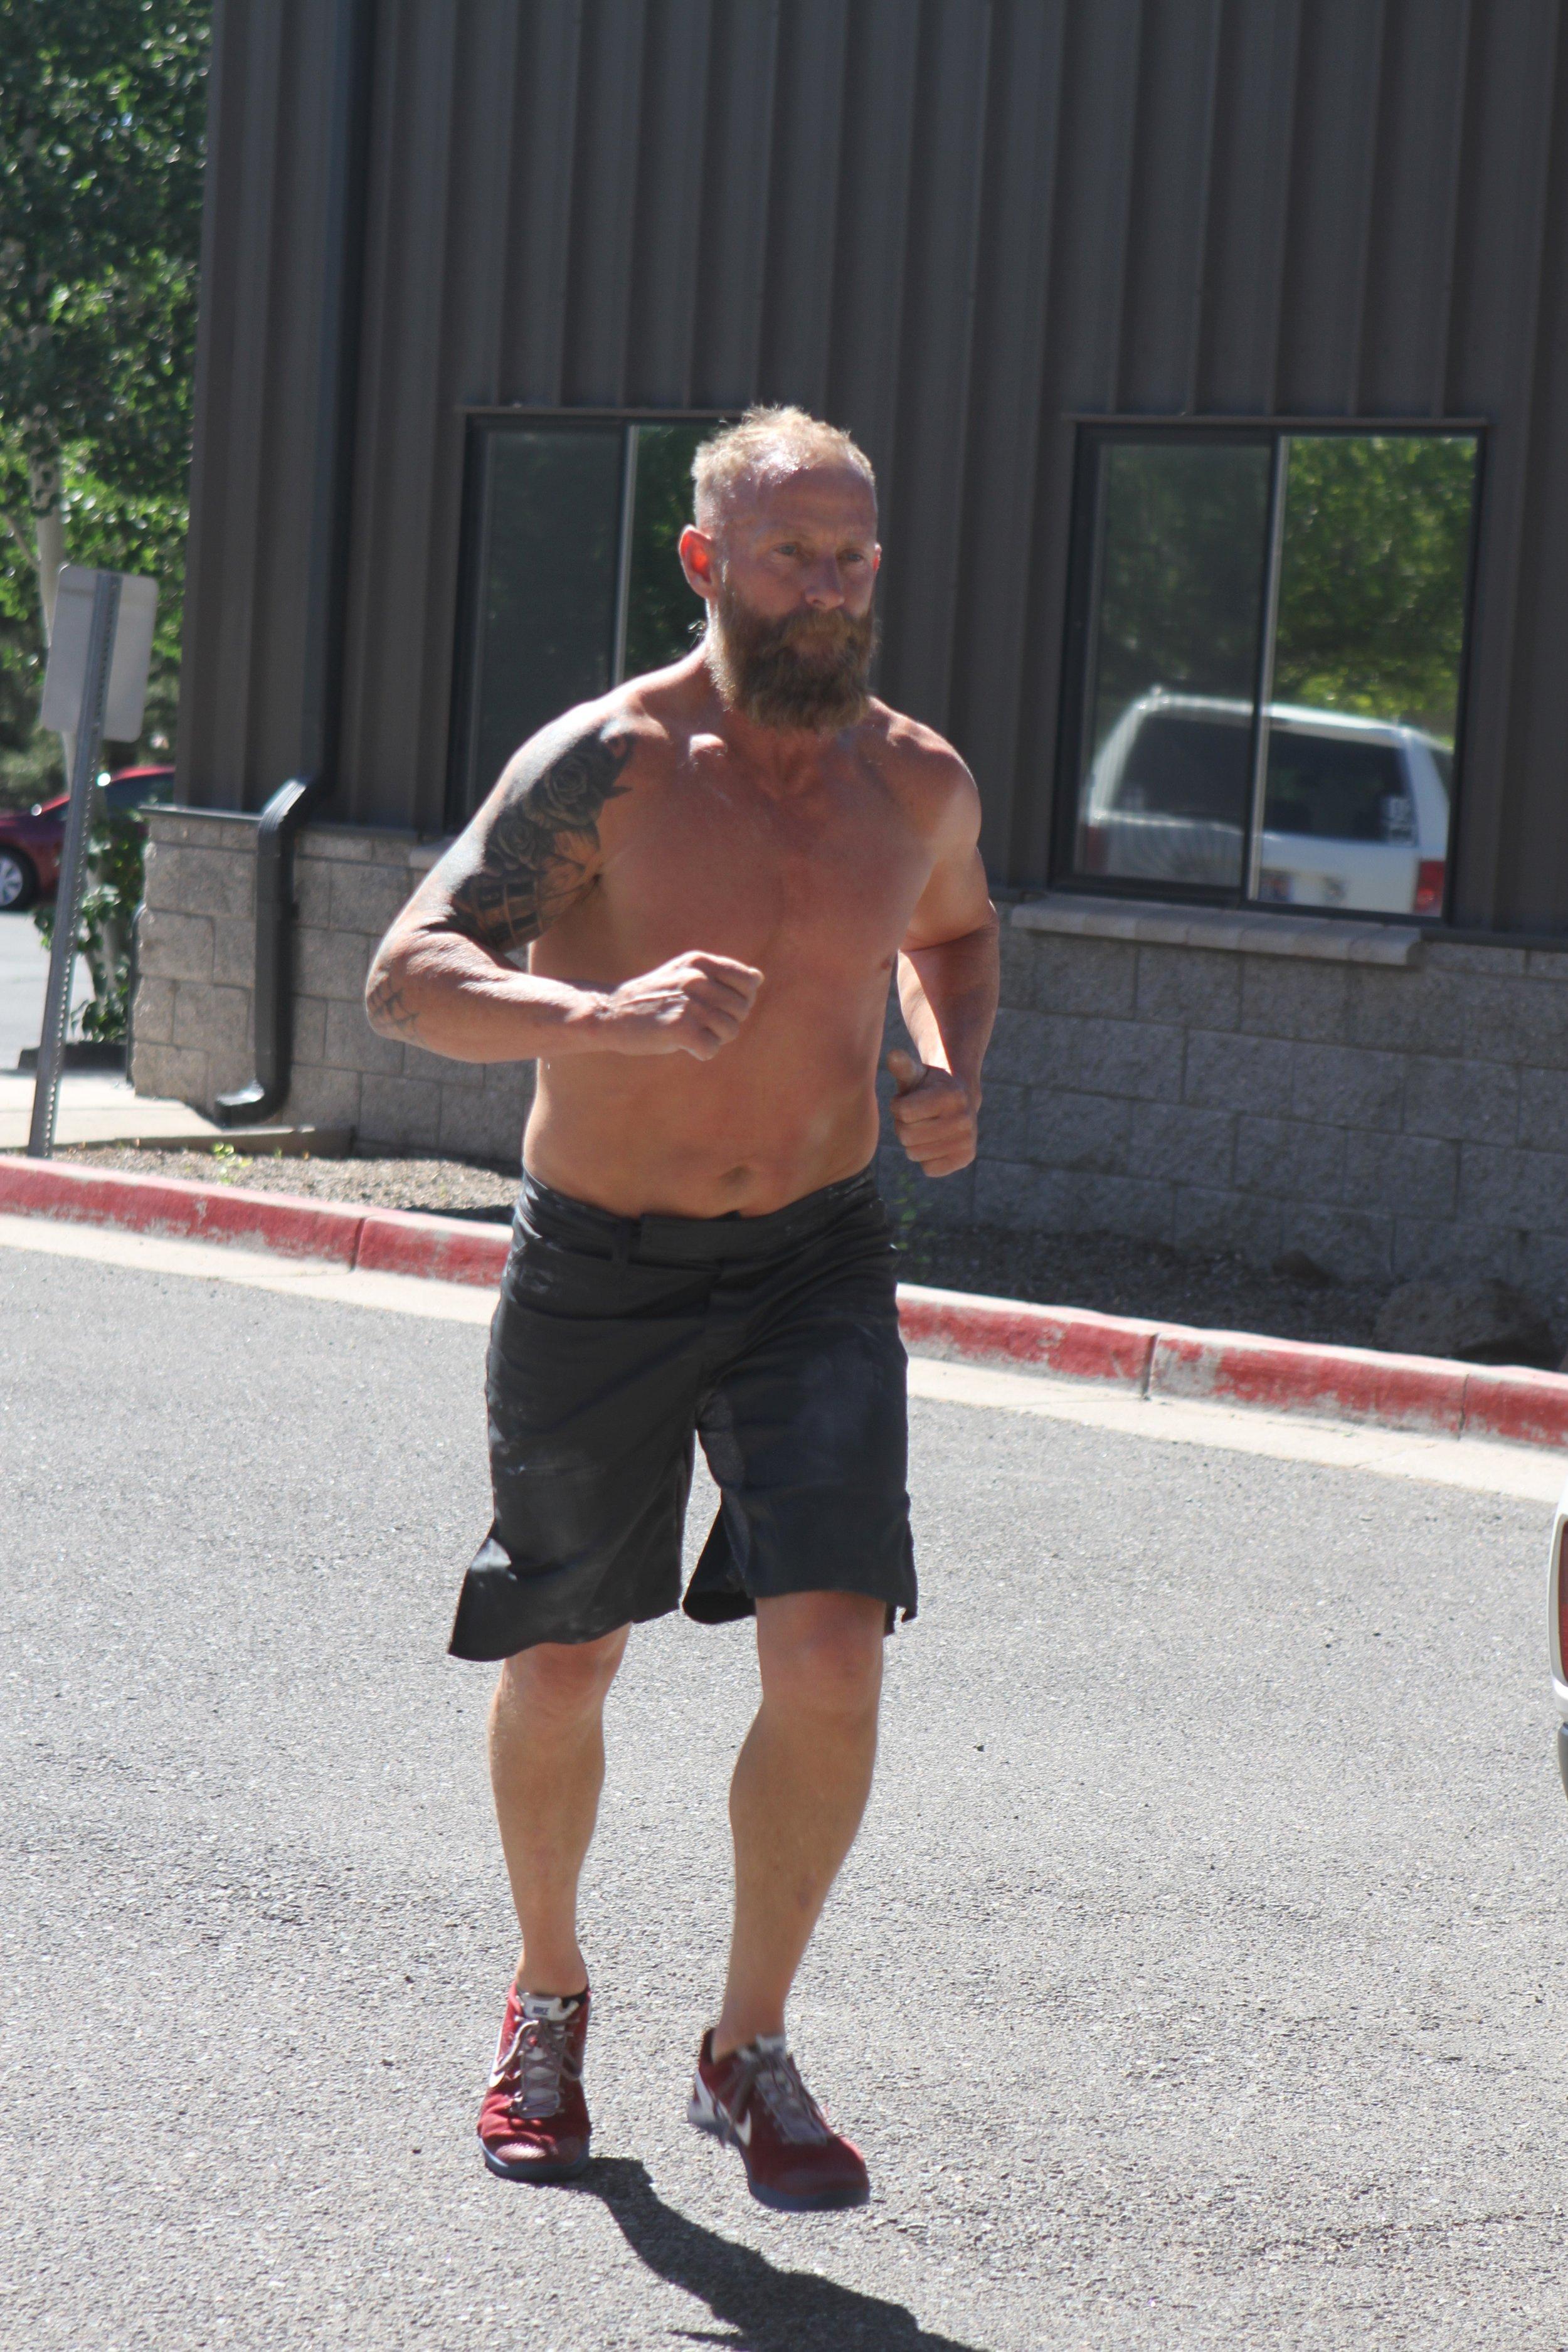 Hot Shot 19 — CrossFit Flagstaff